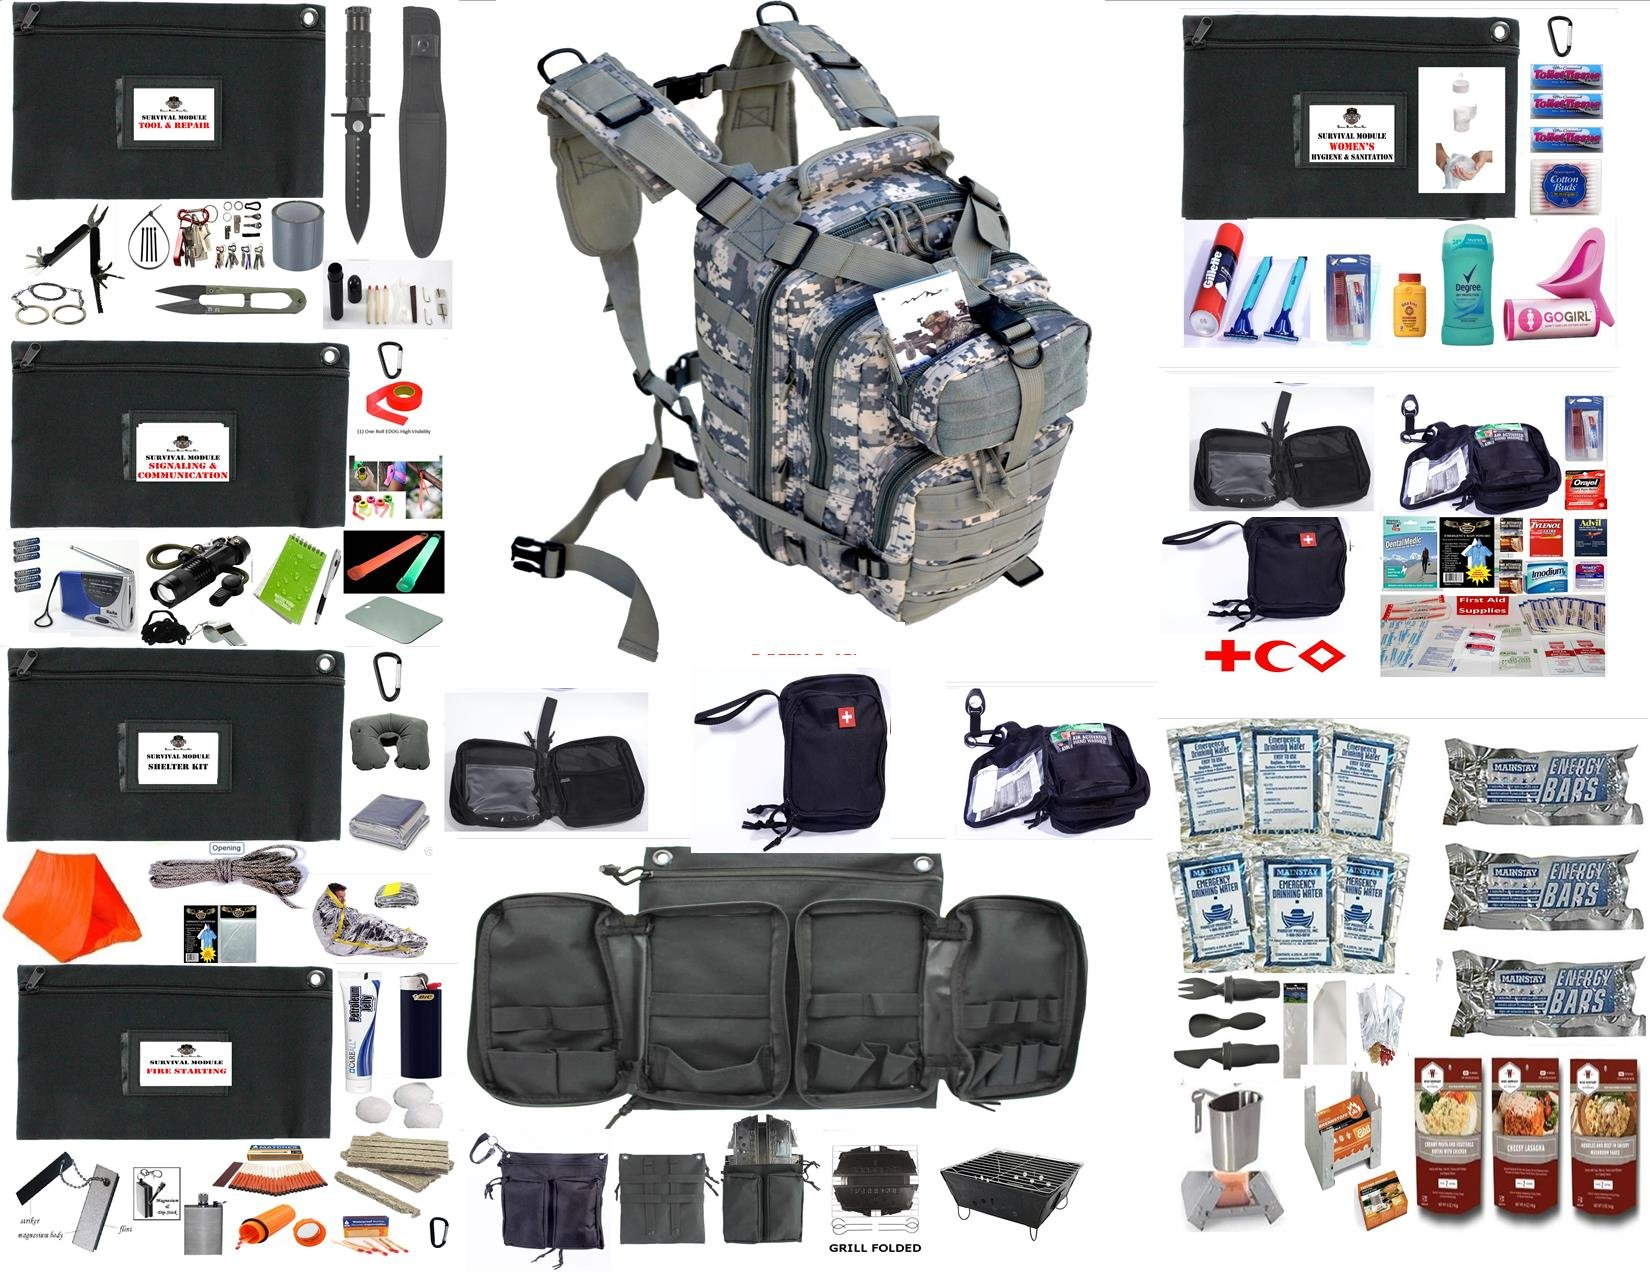 EDOG Women's Emergency Preparedness Disaster 72 Hr Backpack & Modules | Food & Water | Shelter | Fire Starting | Tool & Repair | First Aid | Signaling & Radiio | Hygiene & Sanitation (ACU, WOMEN'S)